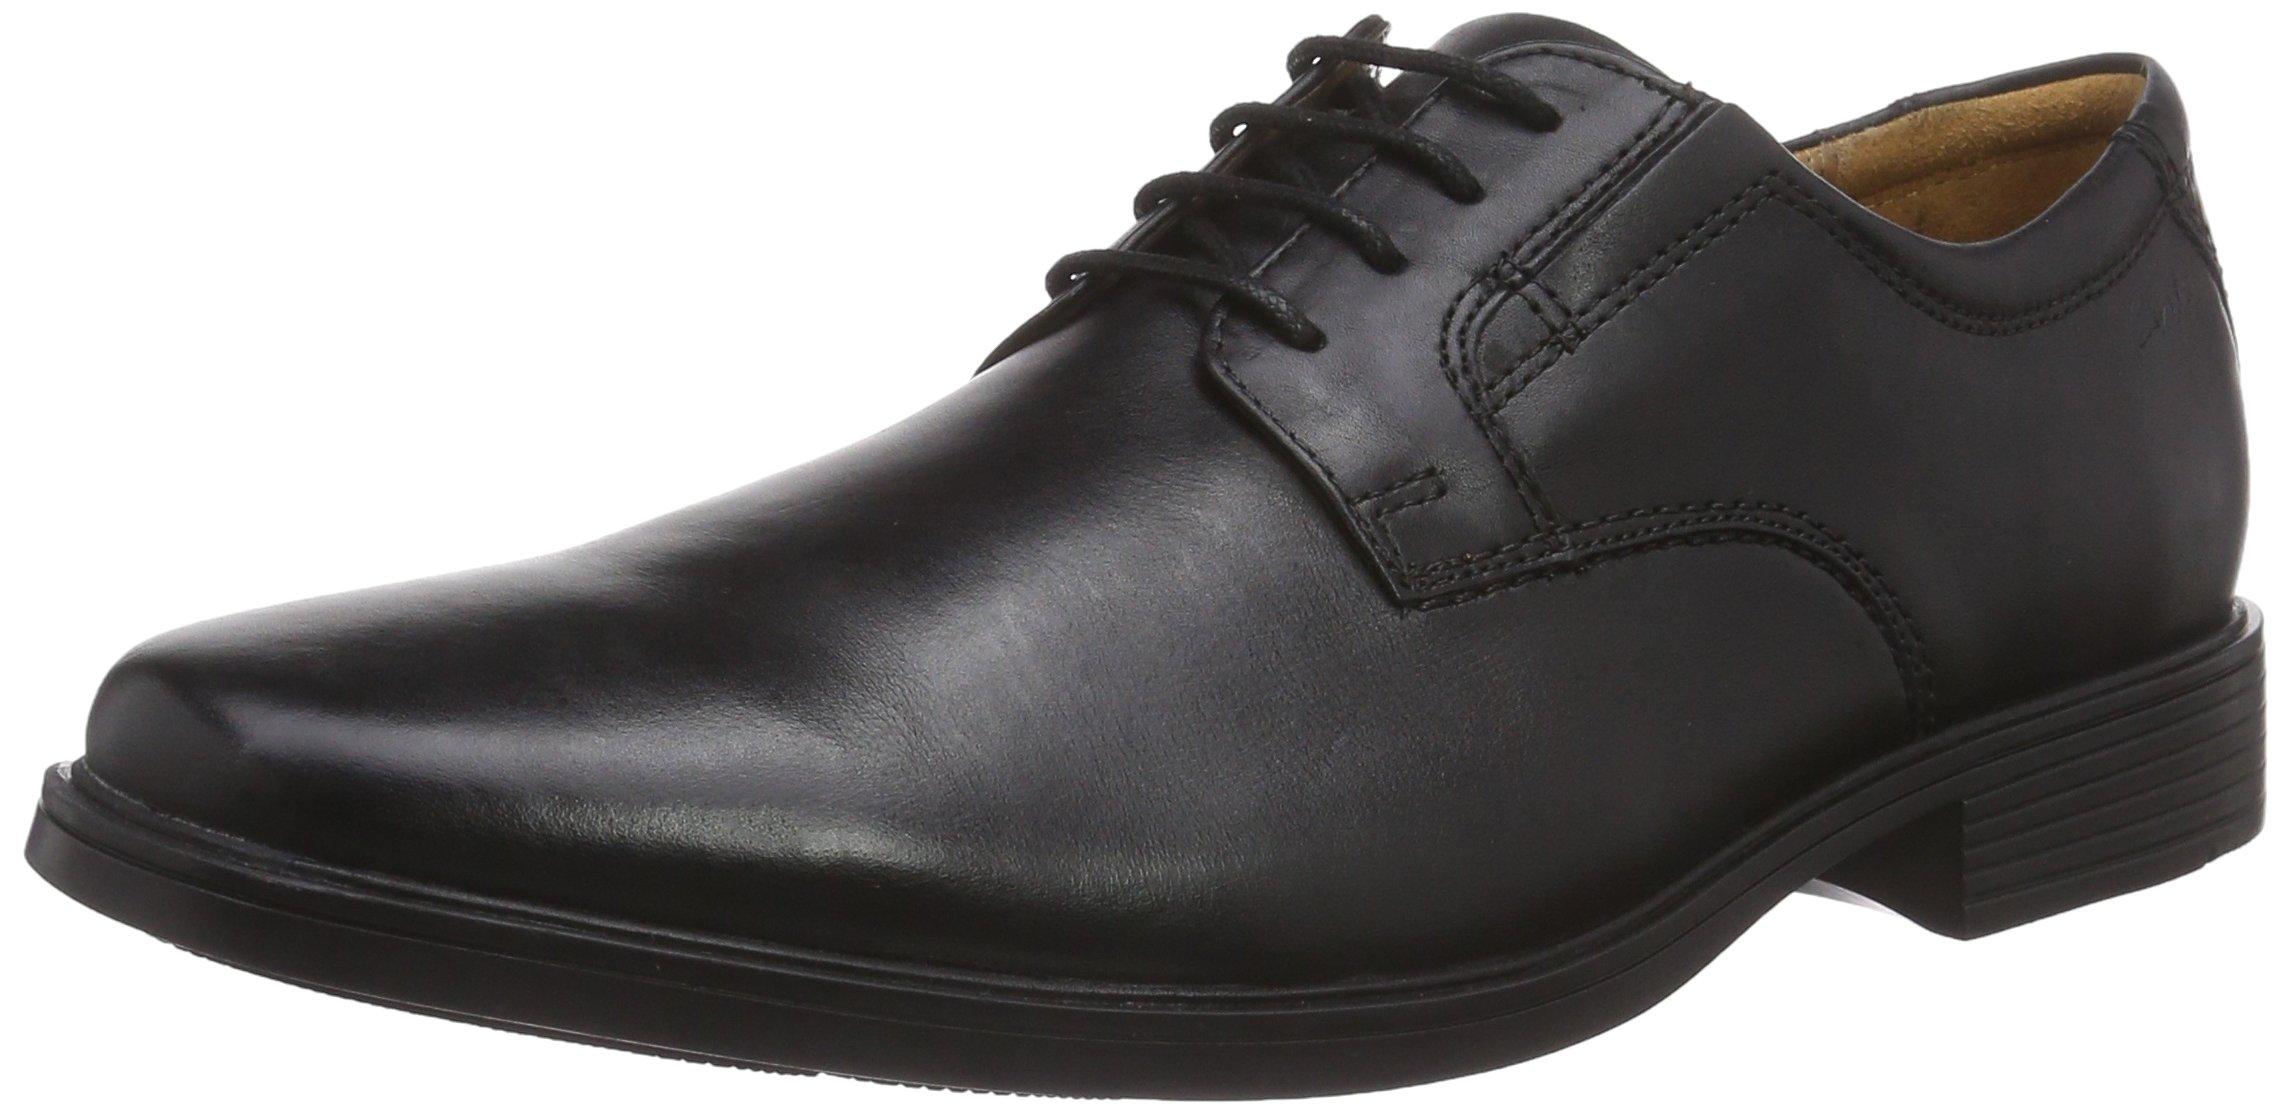 Clarks Tilden Plain - Zapatos con Cordones de Cuero Hombre, Color Negro, Talla 43